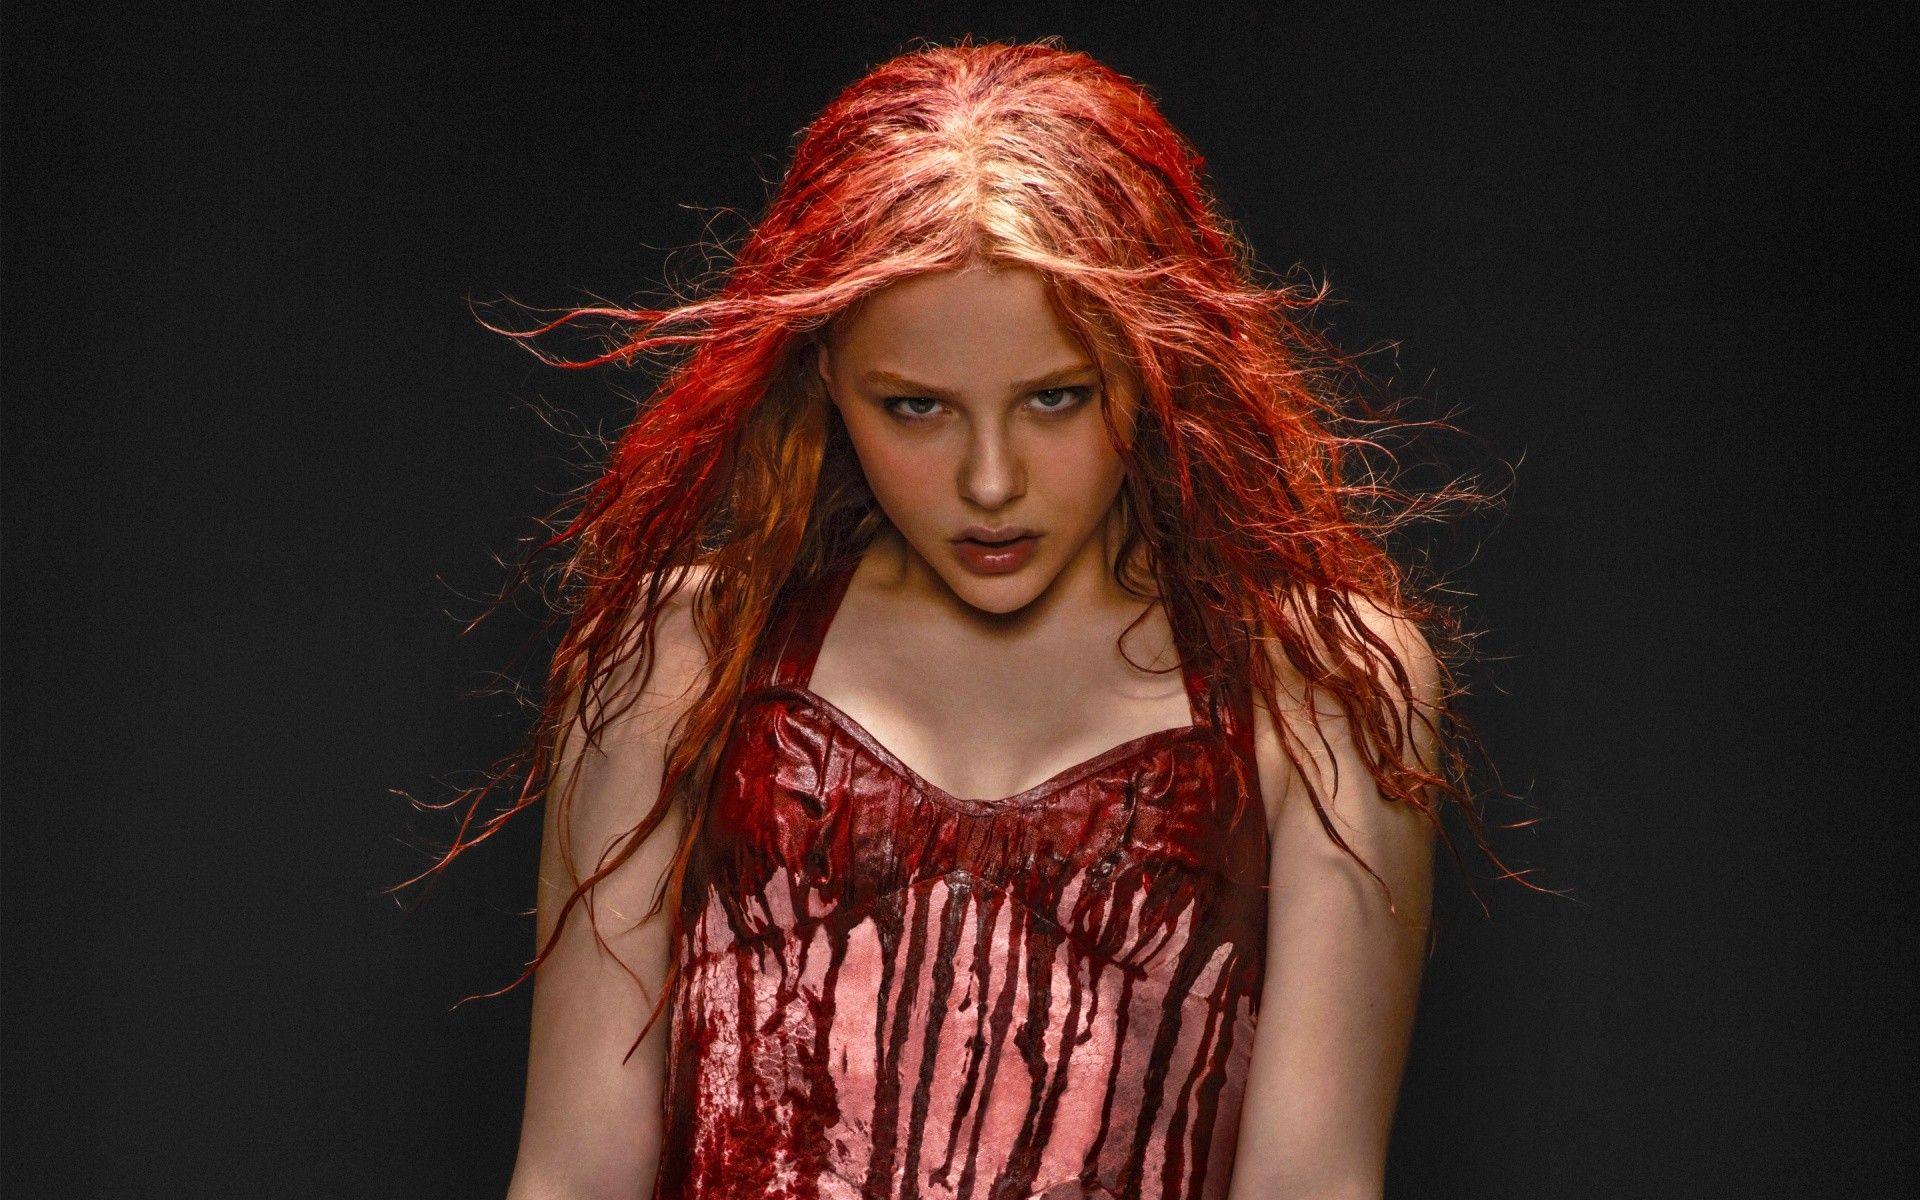 People 1920x1200 Chloë Grace Moretz women actress redhead dyed hair wet hair